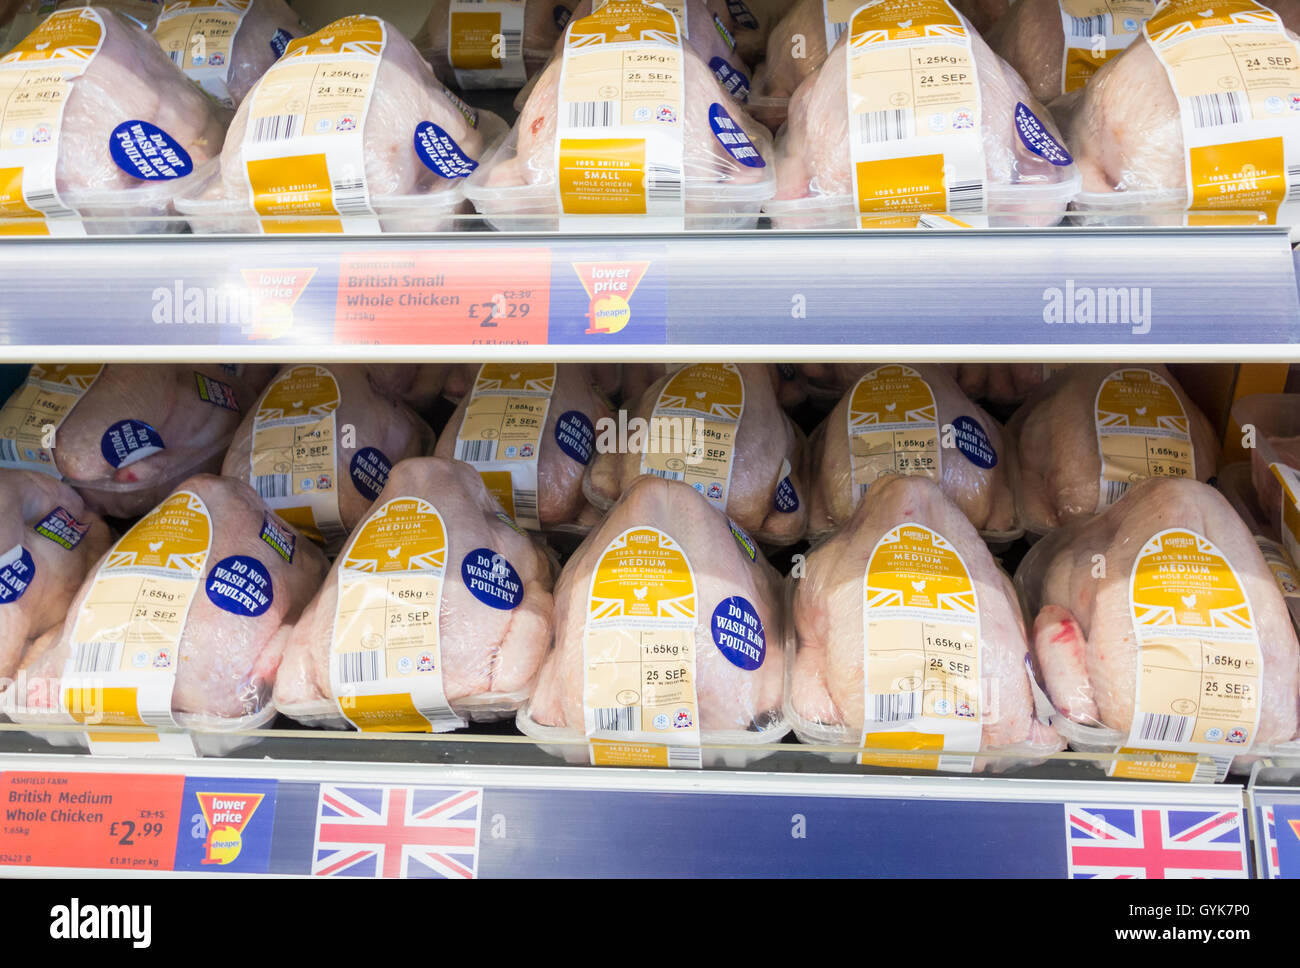 chickens uk stock photos u0026 chickens uk stock images alamy